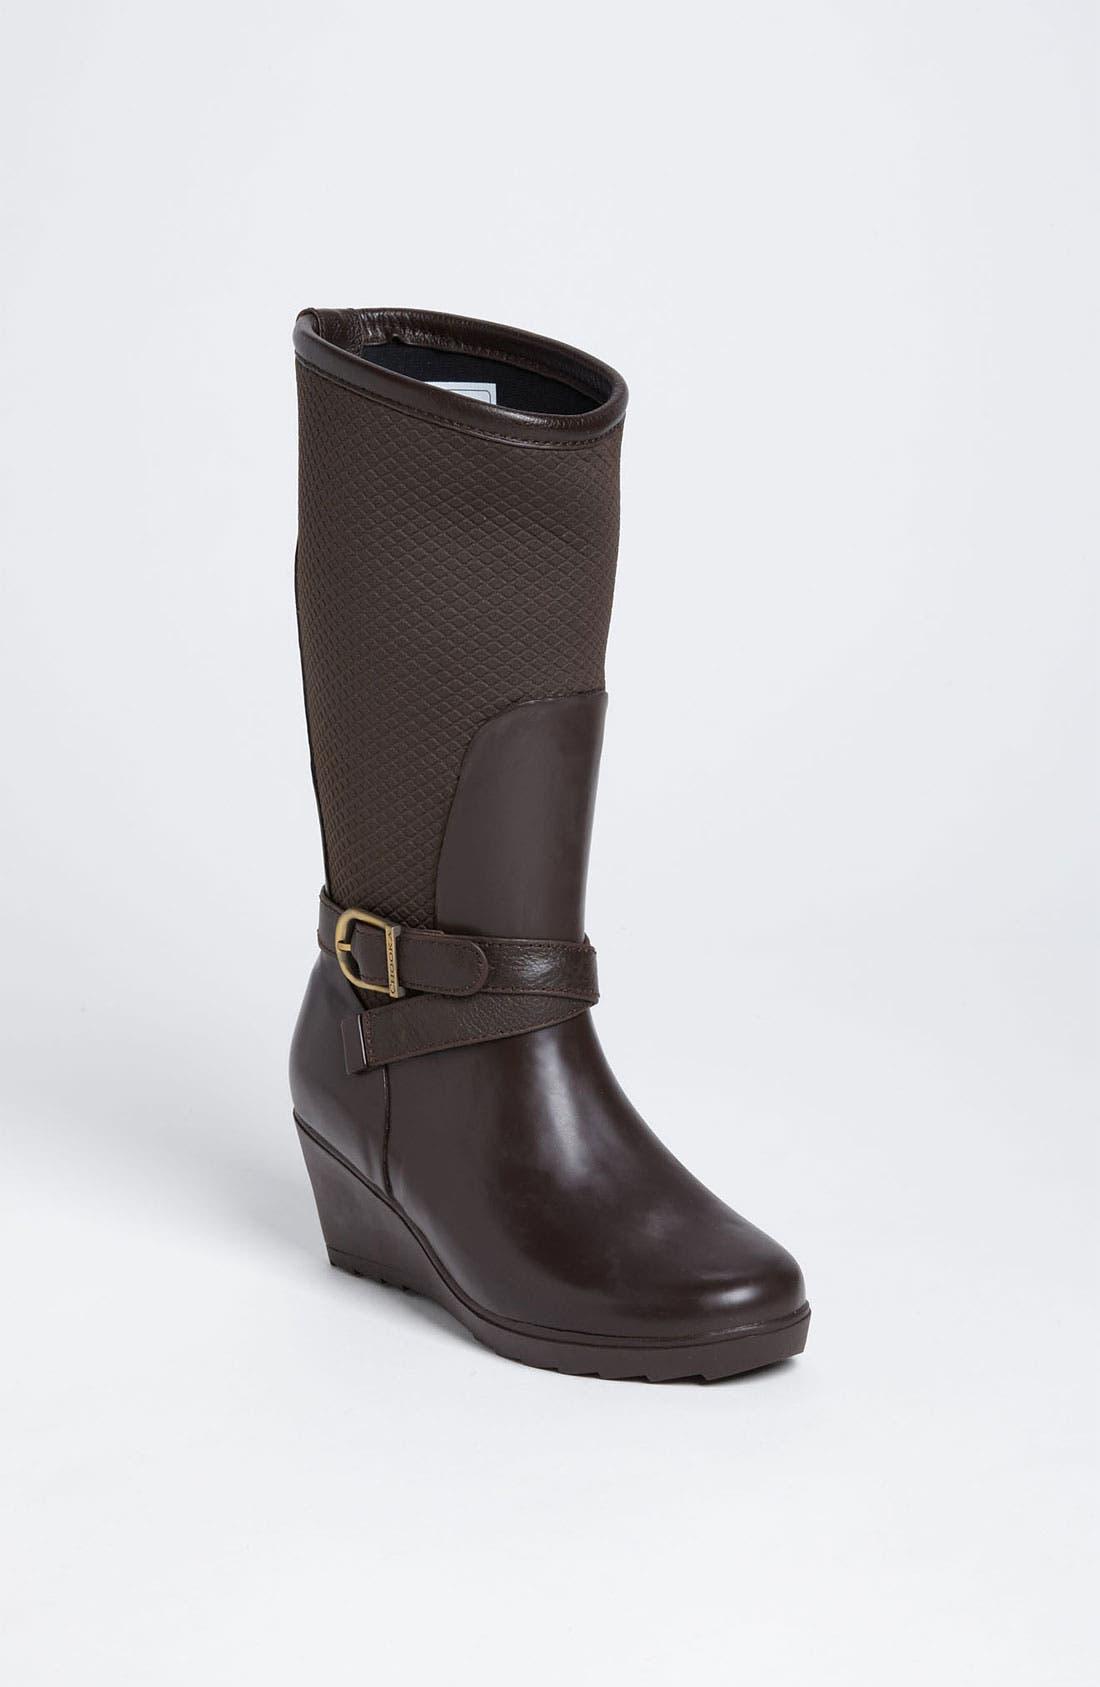 Alternate Image 1 Selected - Chooka 'Seville' Rain Boot (Women)